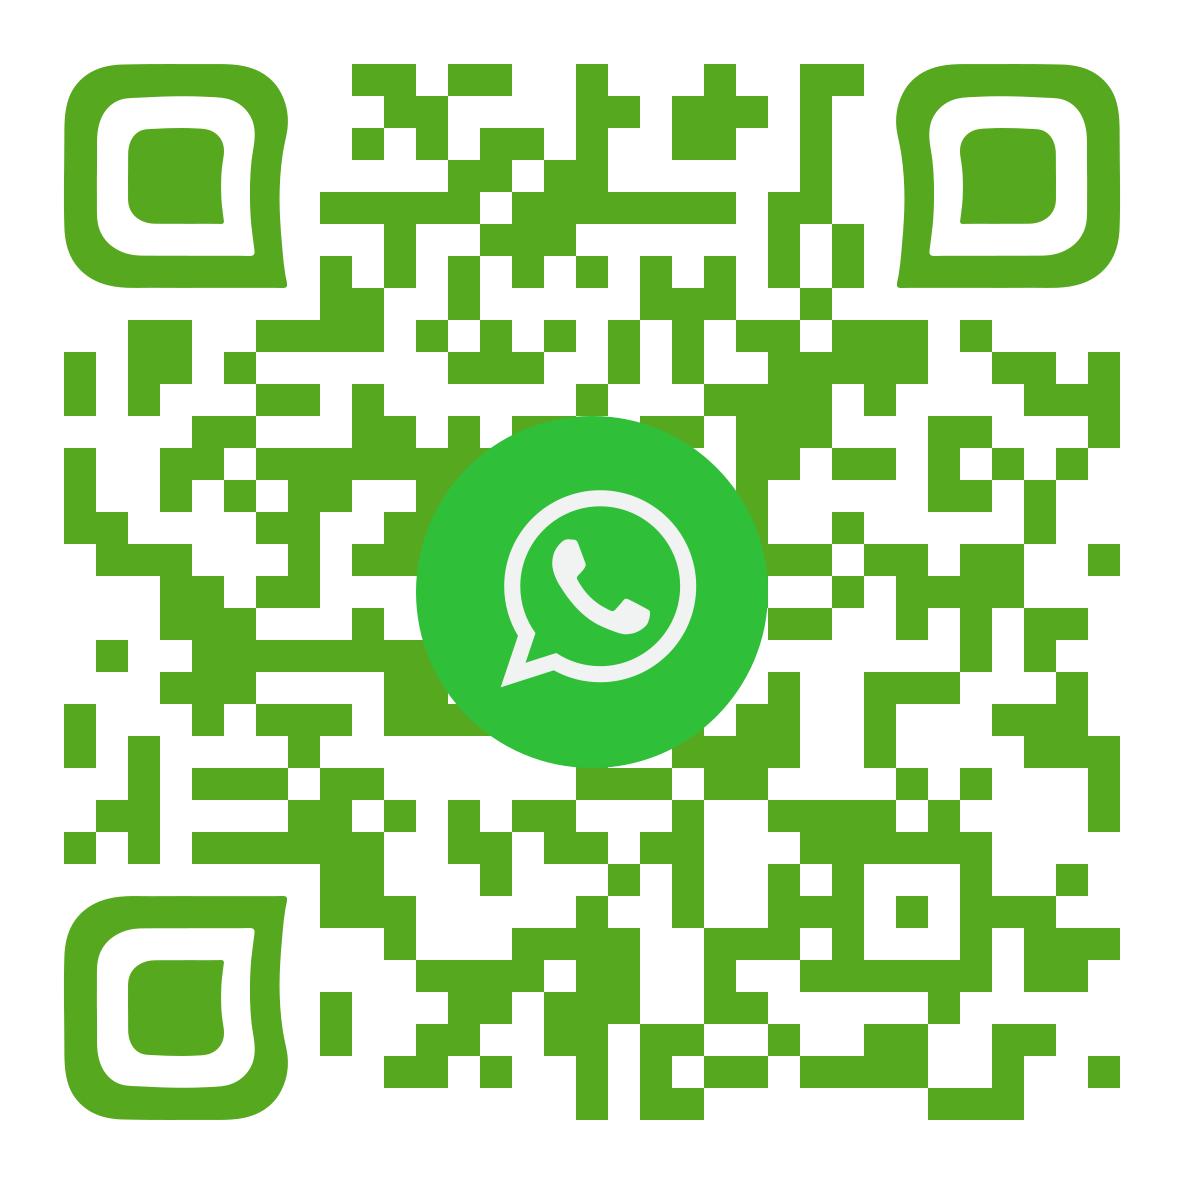 Contactez-moi par SMS via WhatsApp